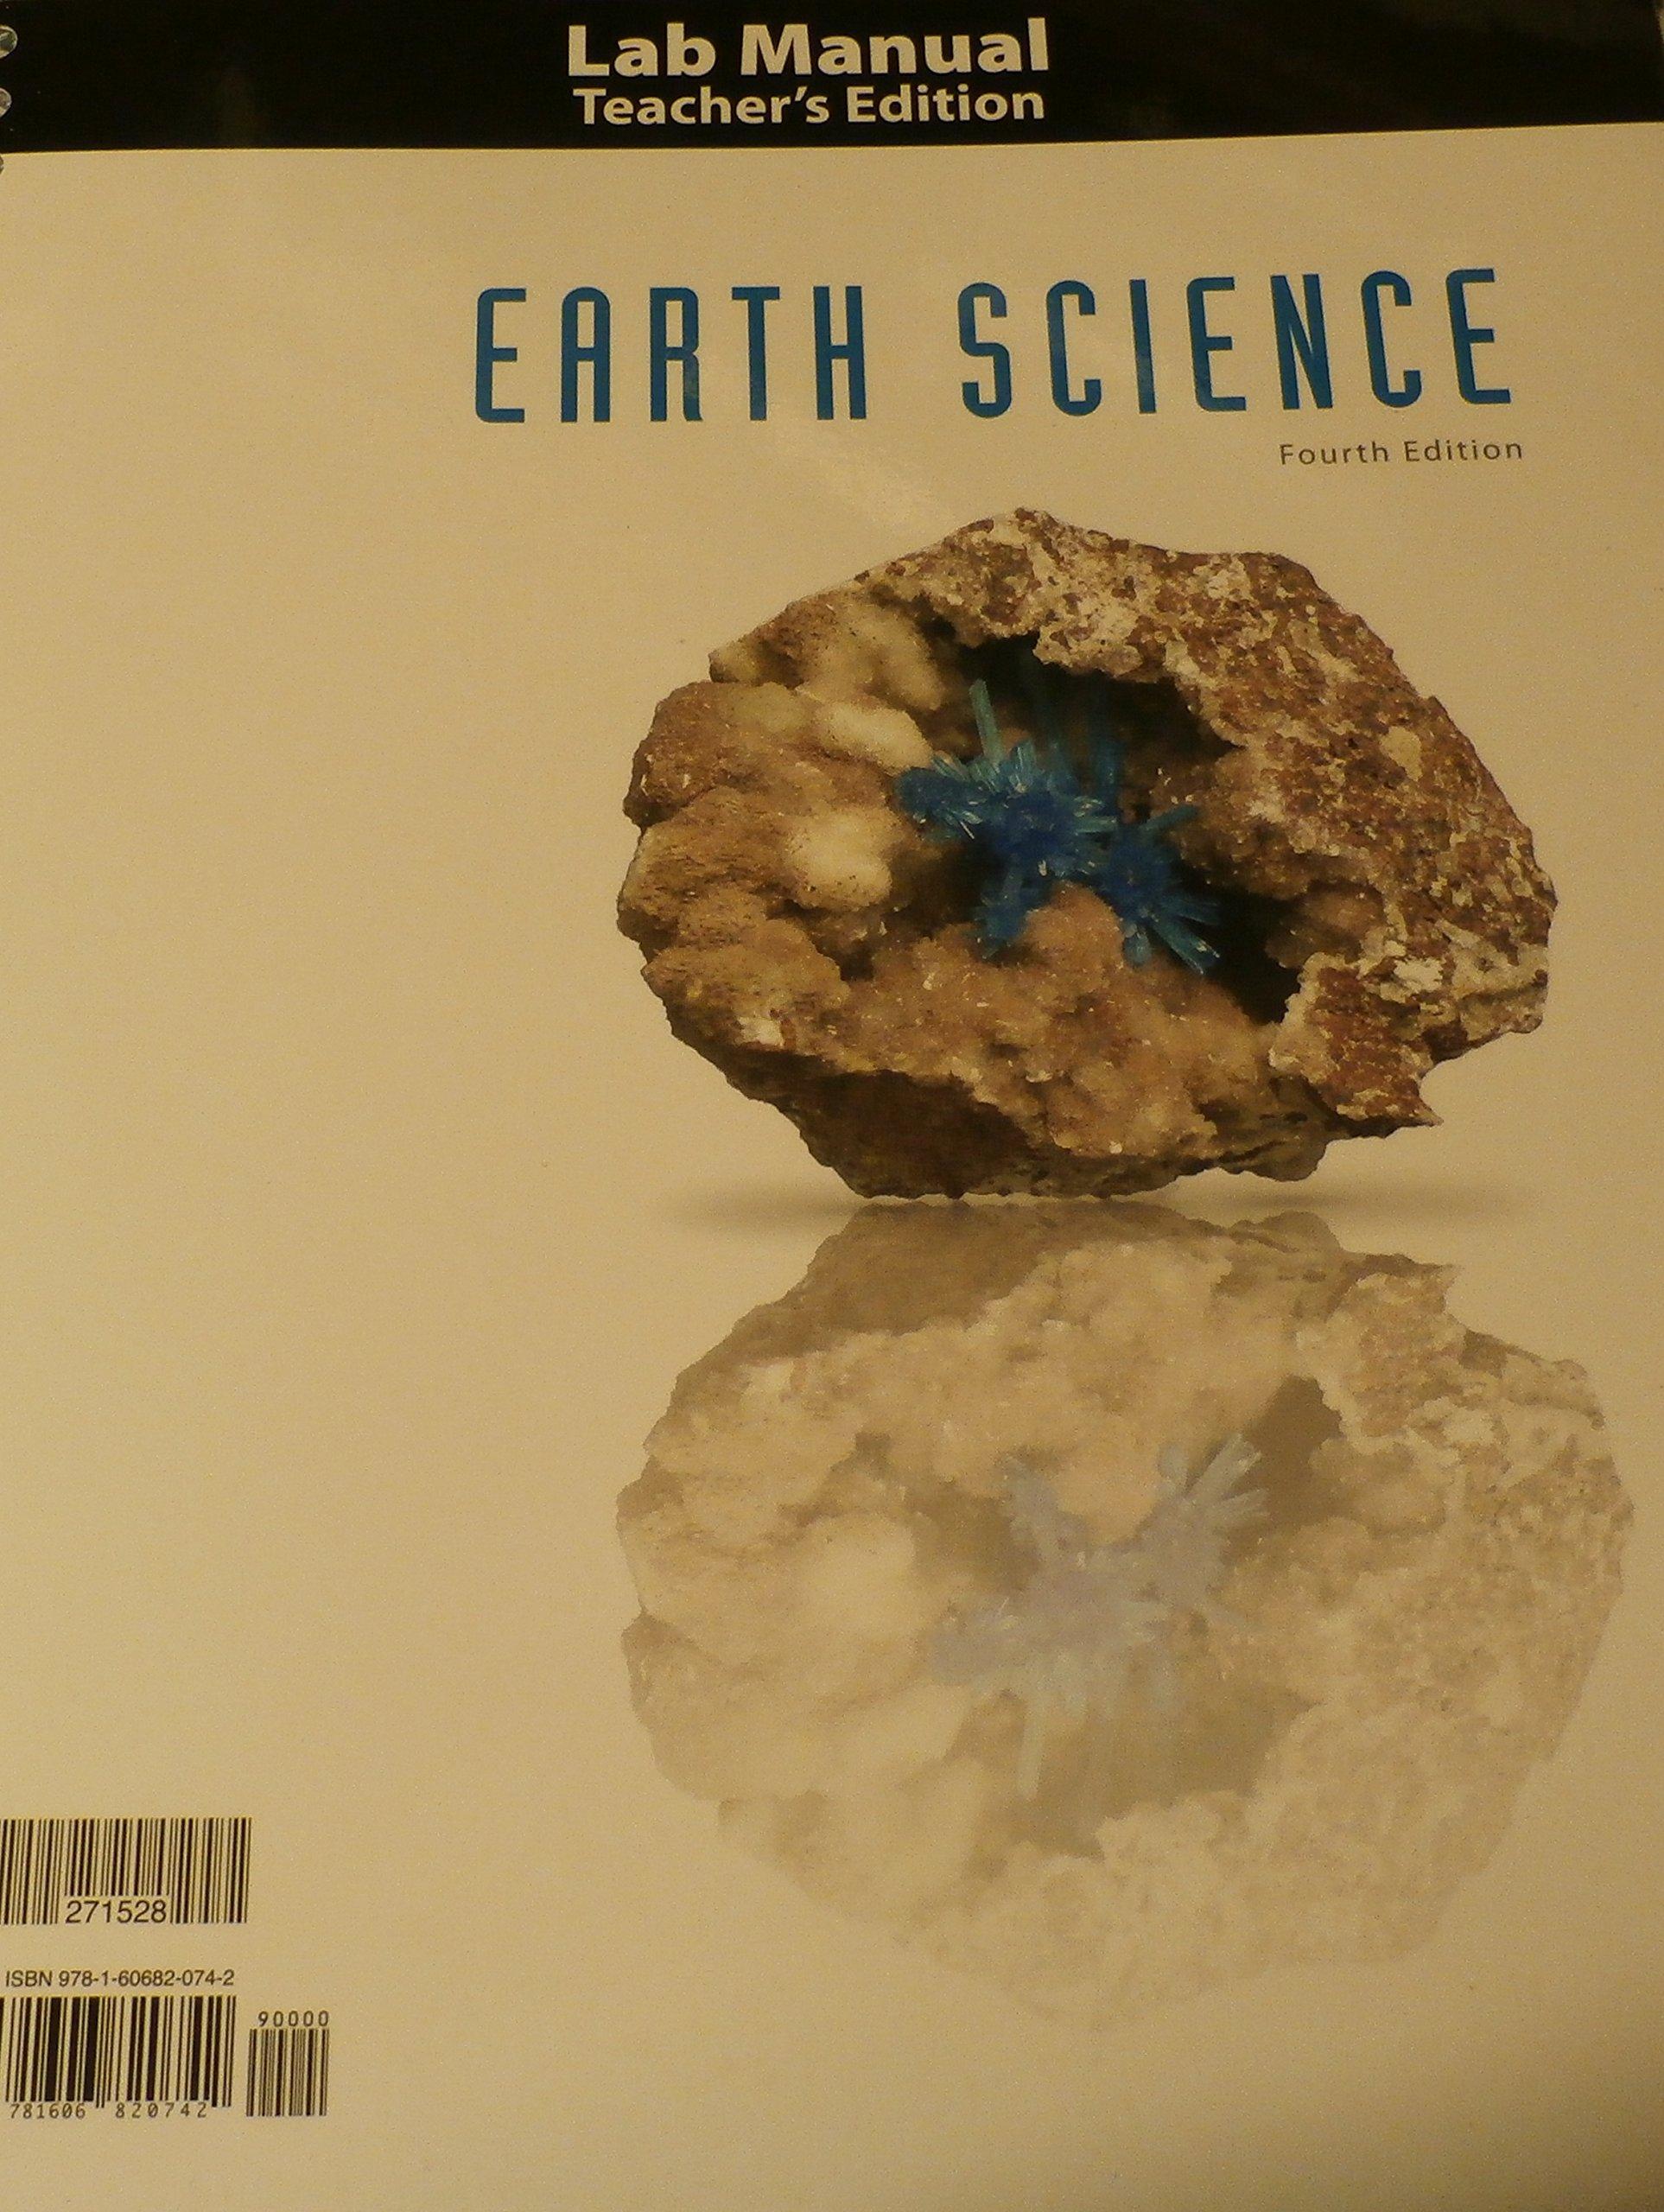 earth science 4th edition teacher edition lab manual bob jones rh amazon com earth science lab manual fourth edition Earth Science Week